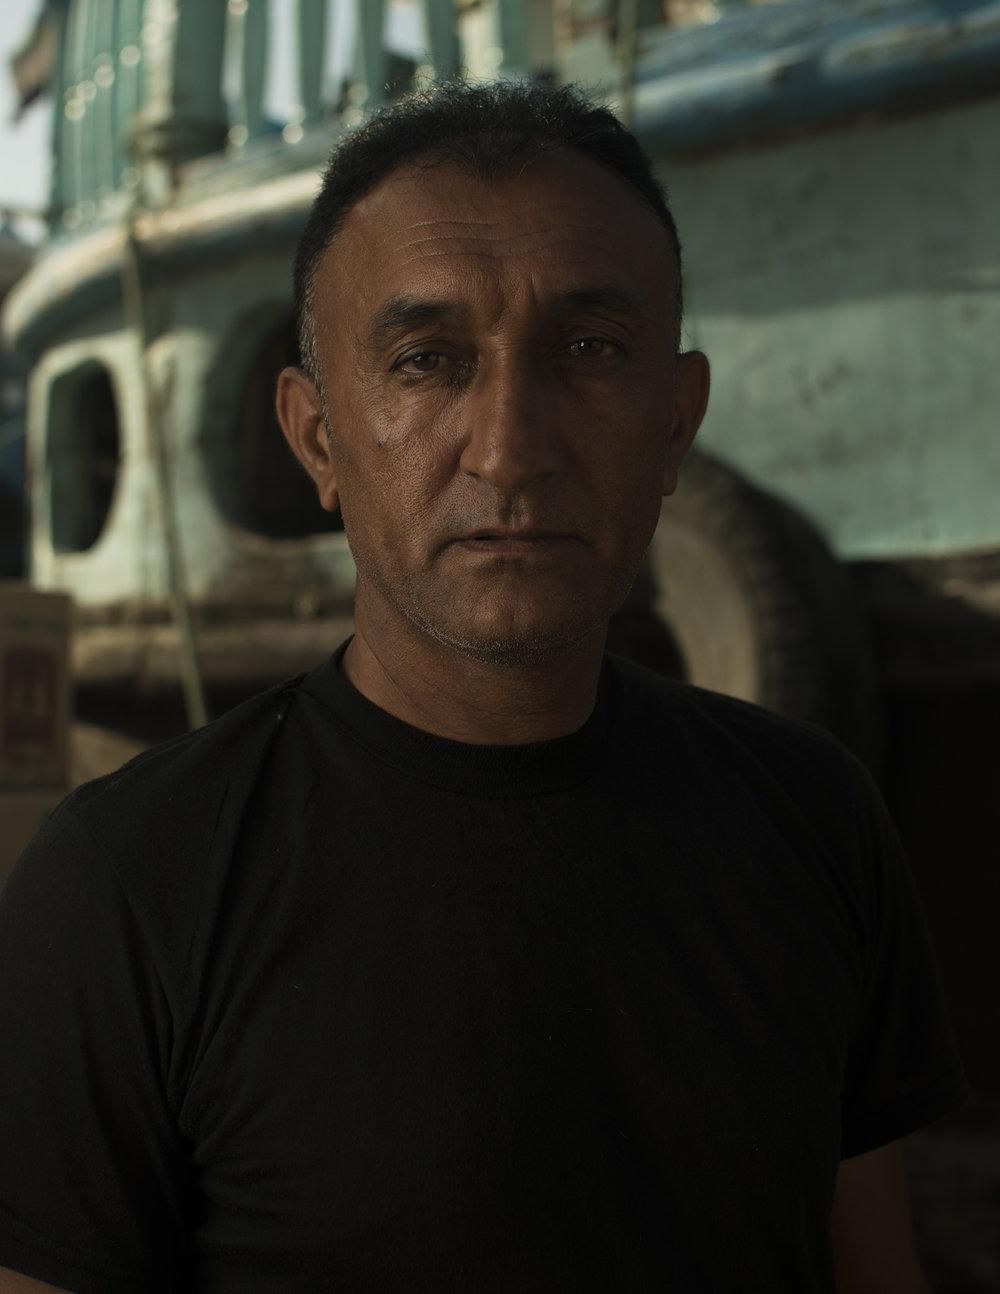 Copy of Dock worker, Deira, Dubai